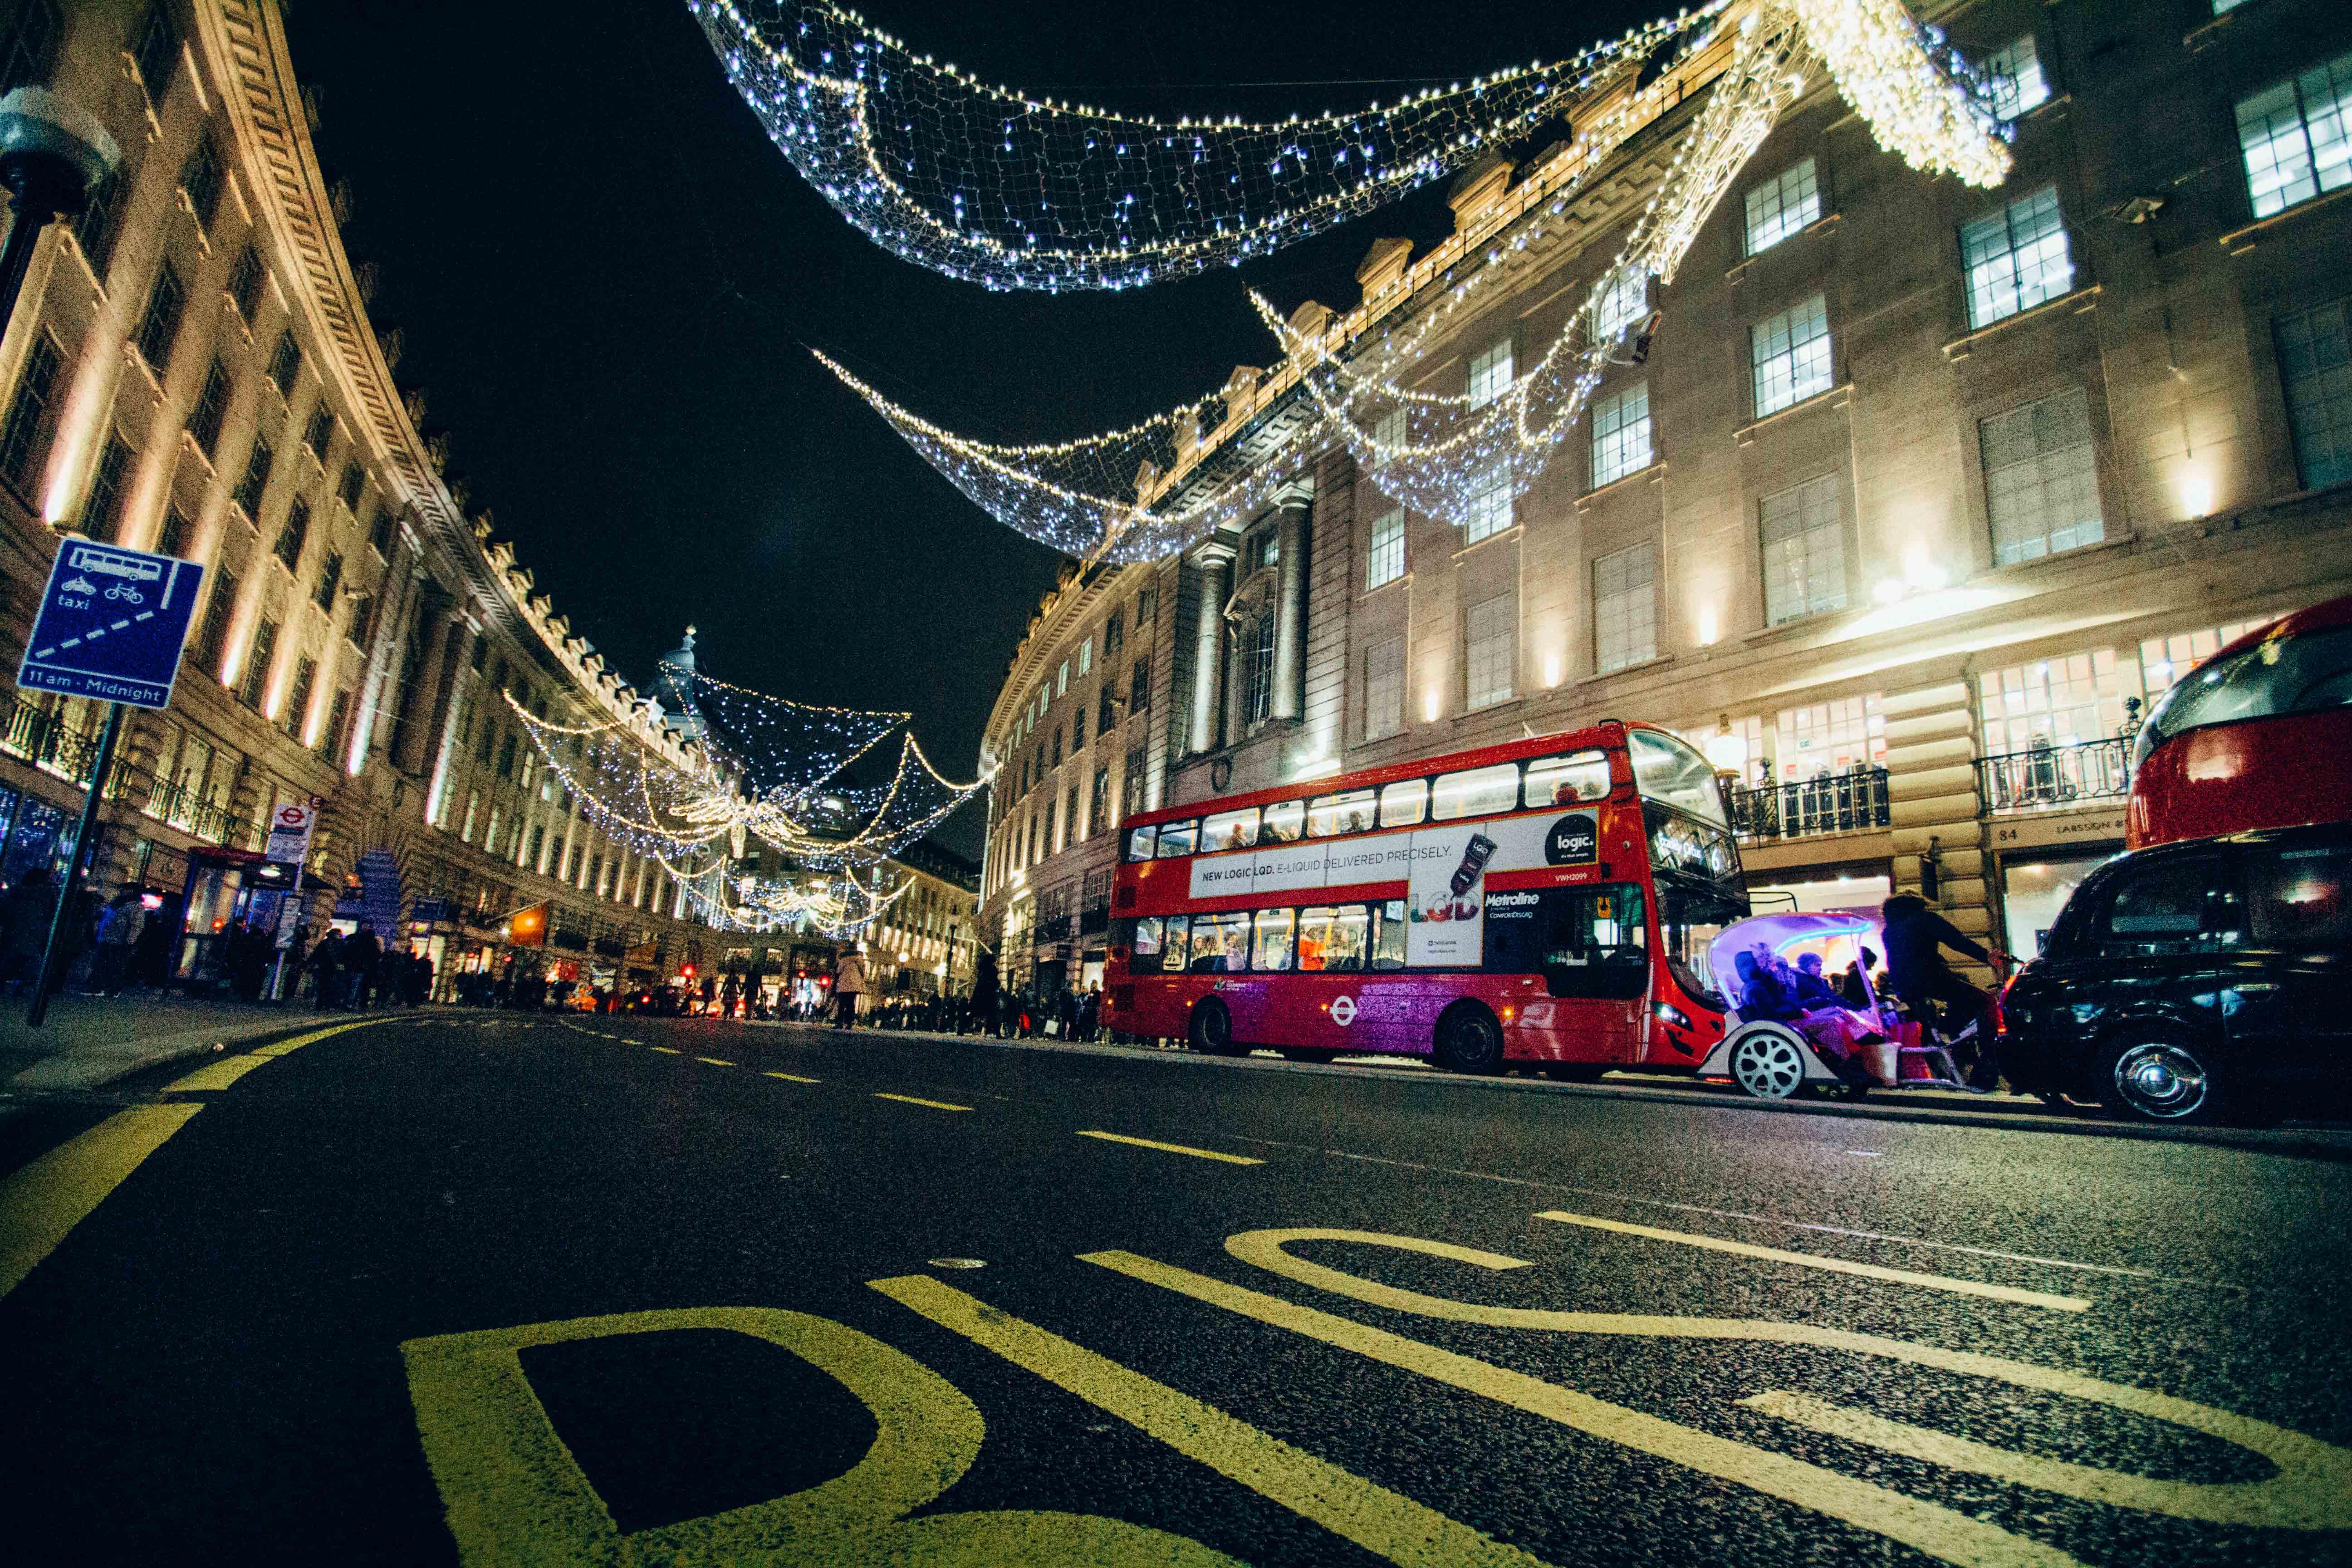 All Car Hd Wallpaper Download View Of Illuminated City At Night 183 Free Stock Photo